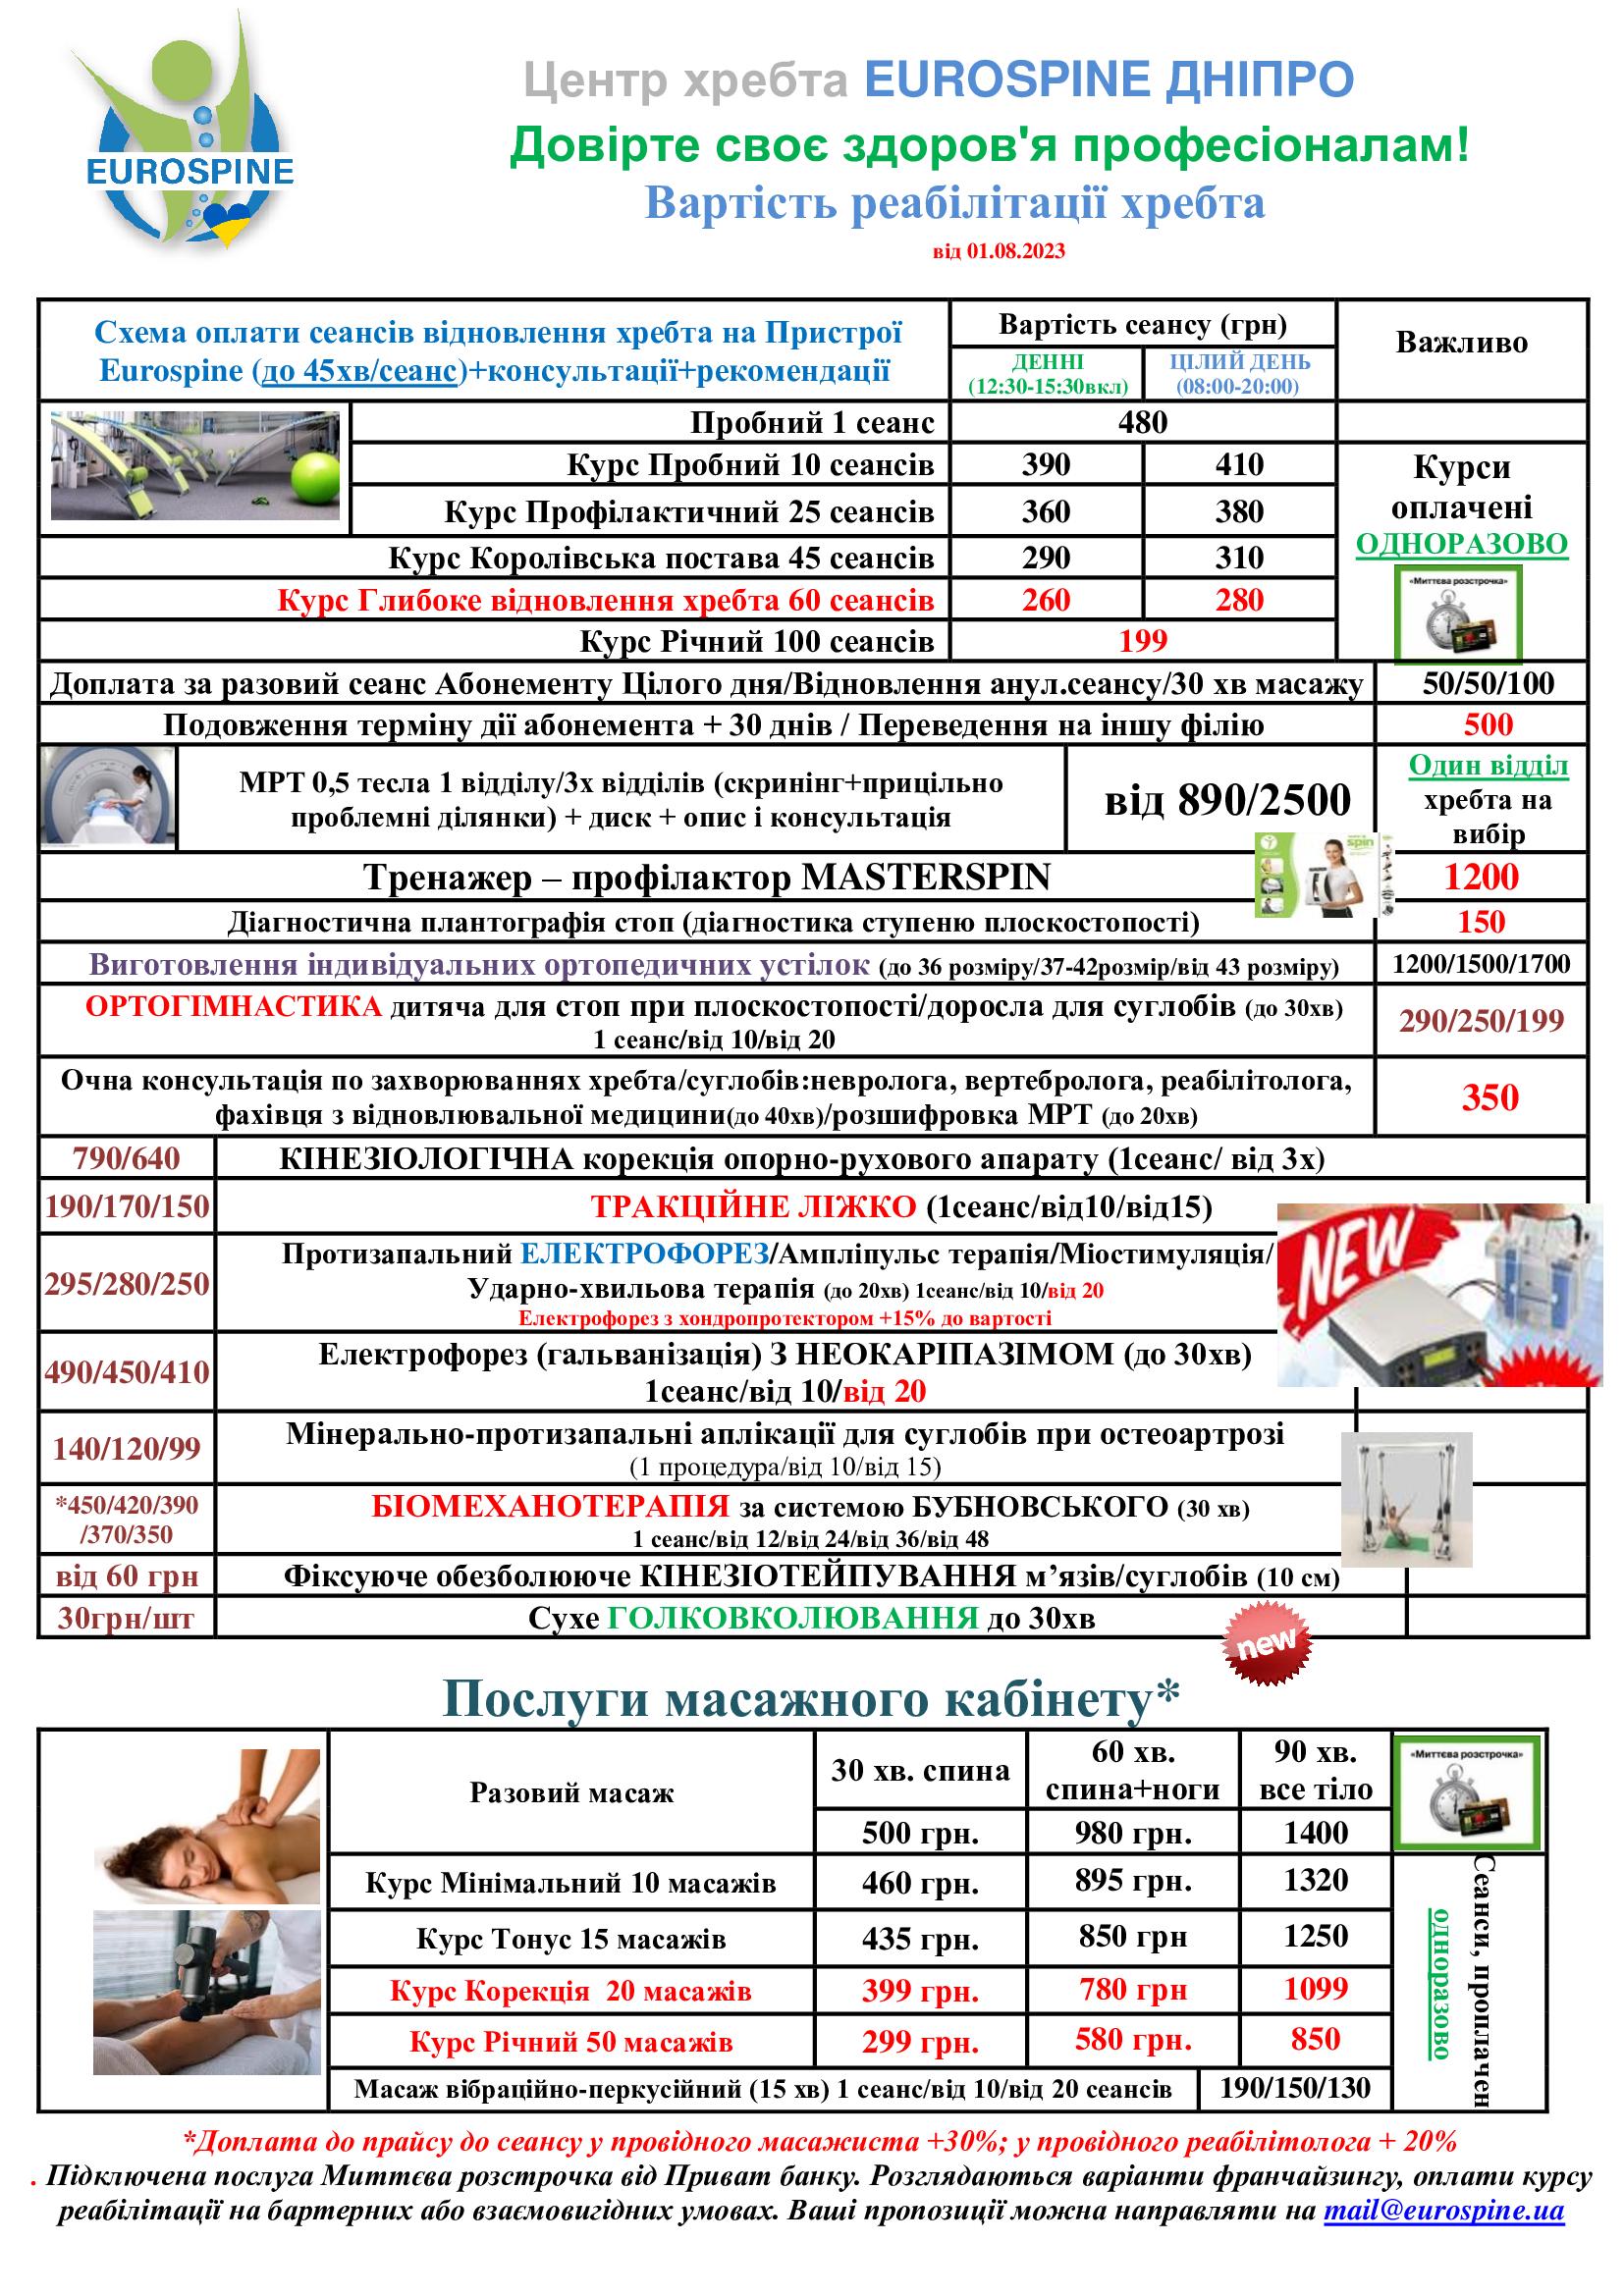 http://eurospine.ua/price/dnepr.jpg